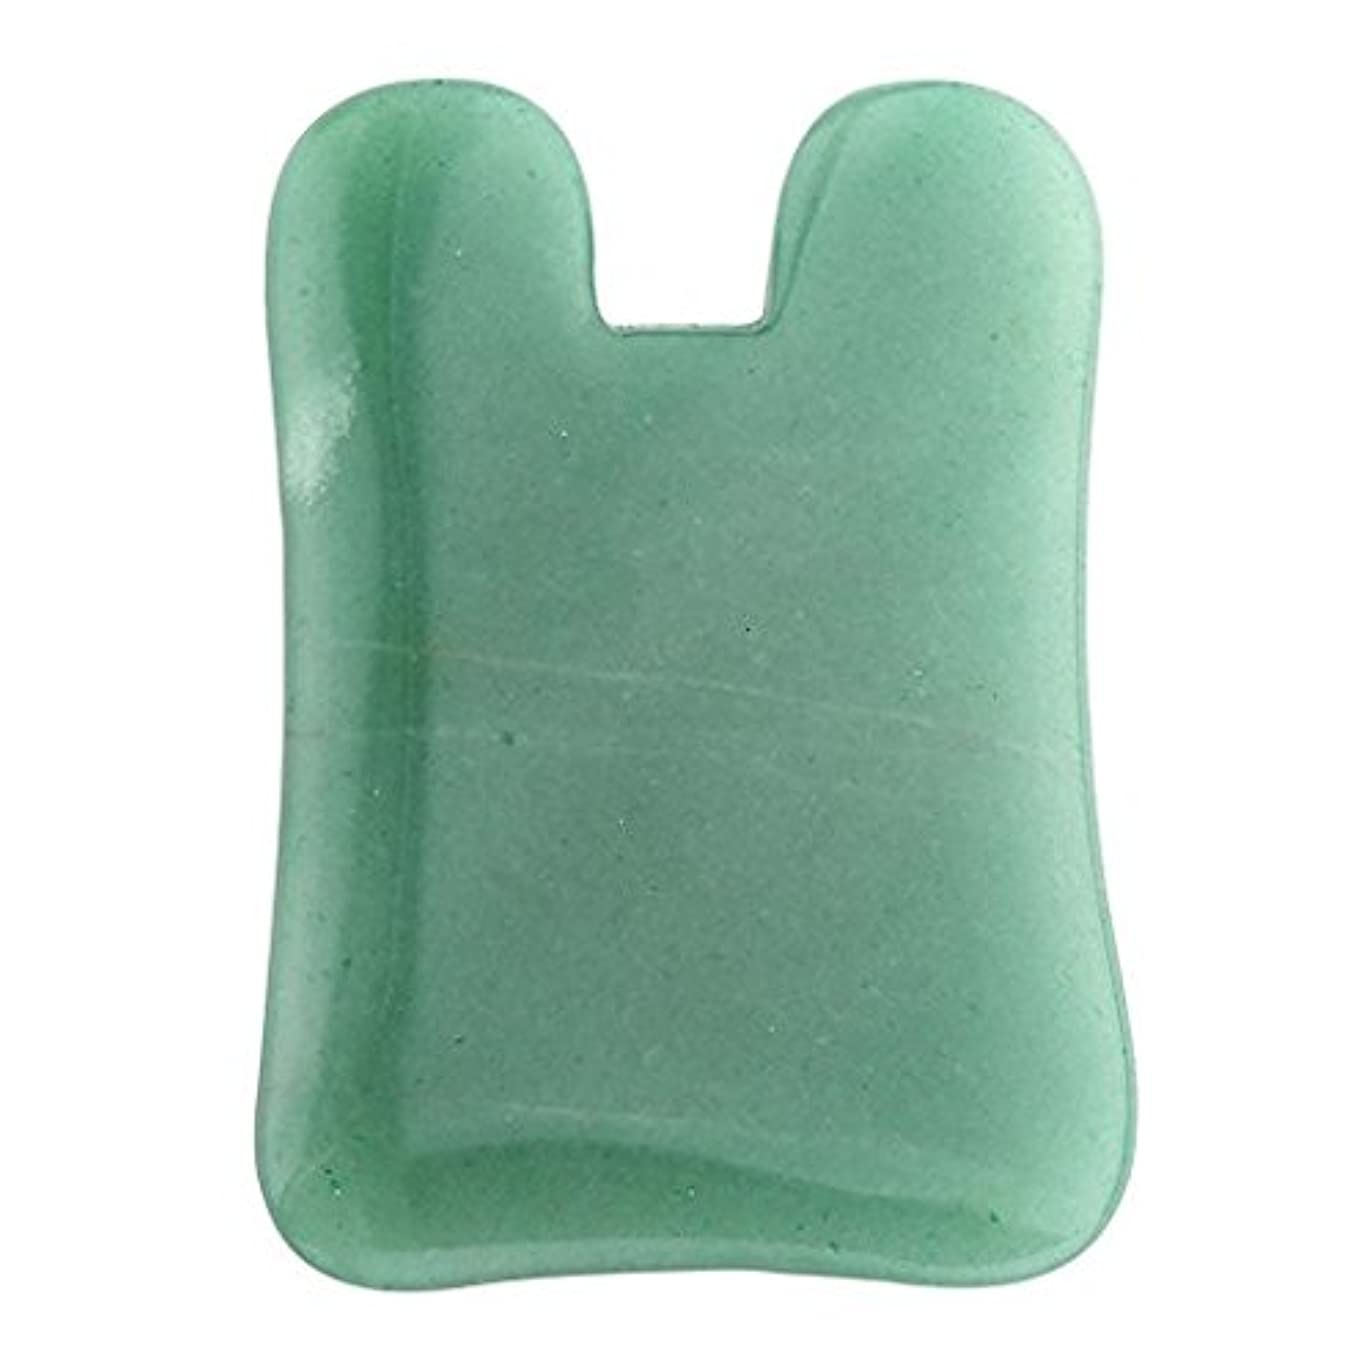 1pc Face/Body Massage Jade Adventurine Natual stone Gua Sha acupress toolジェイドかっさプレート 翡翠かっさ,顔?ボディのリンパマッサージ (U shape)